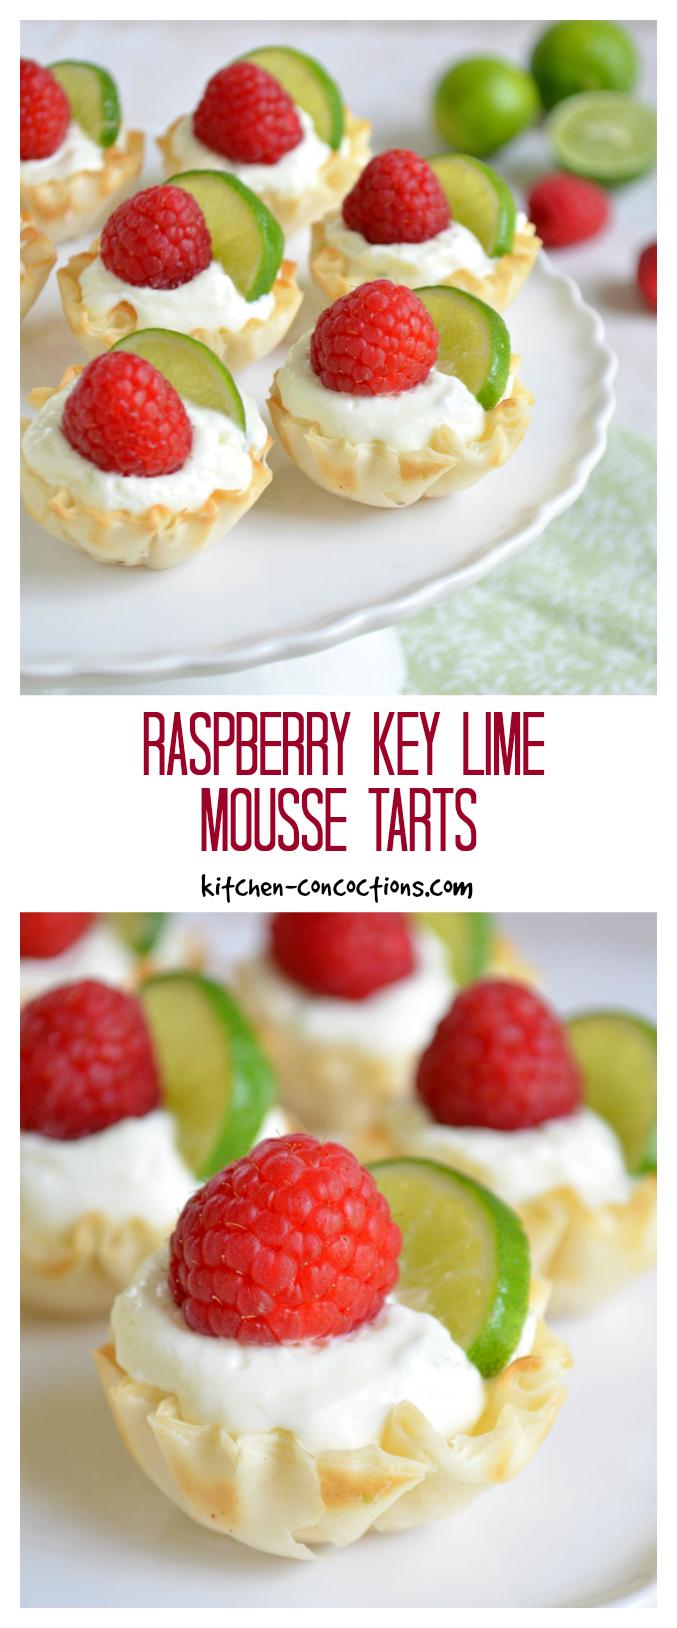 Raspberry Key Lime Mousse Tarts